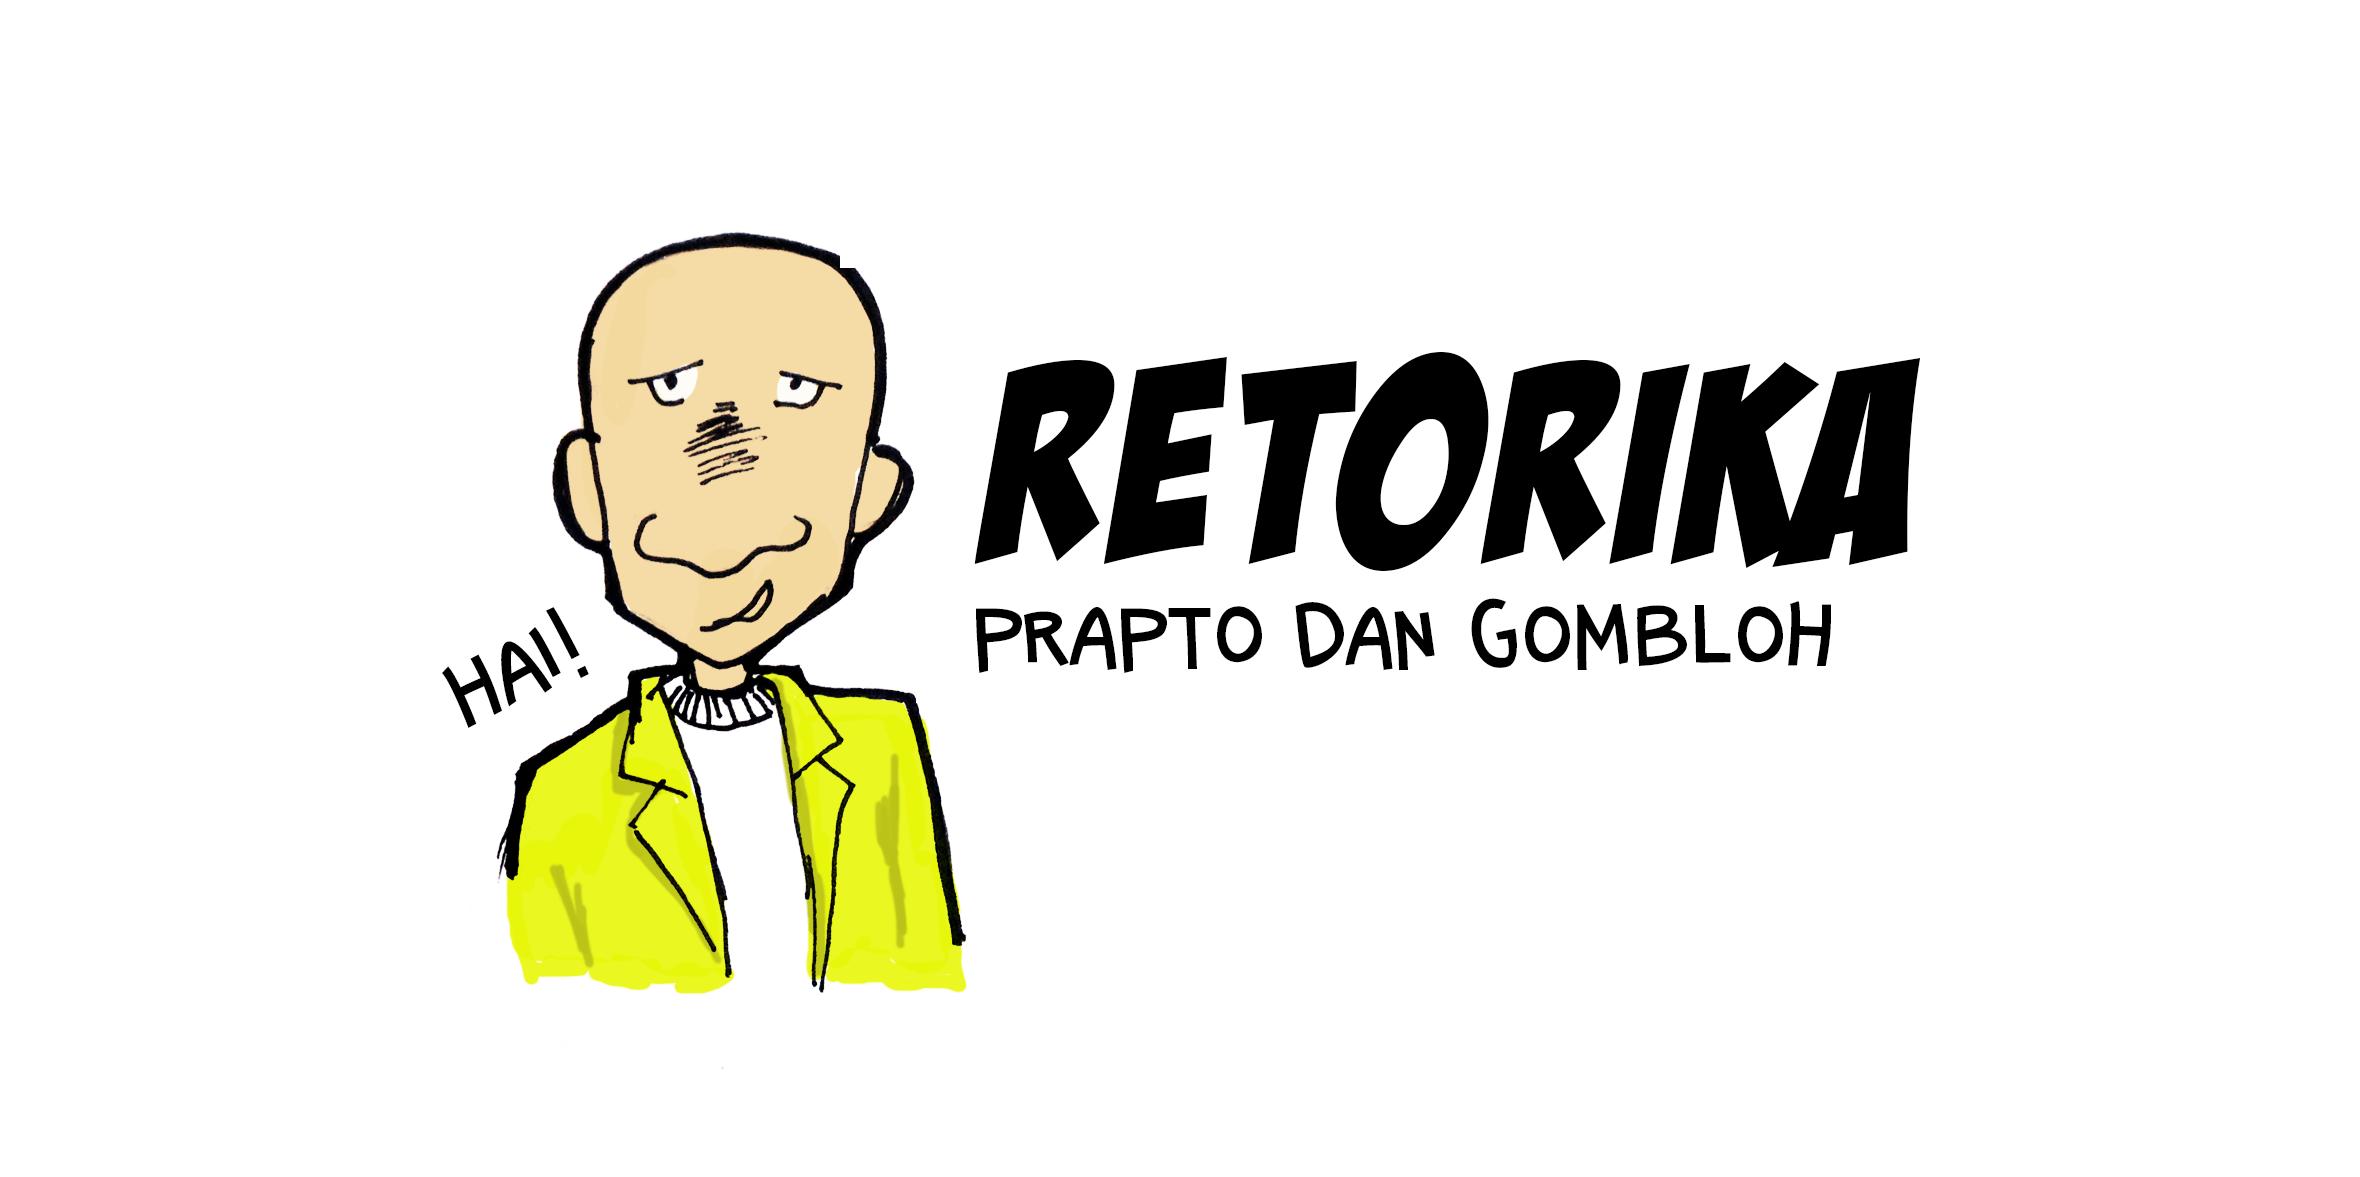 mr_retorika4